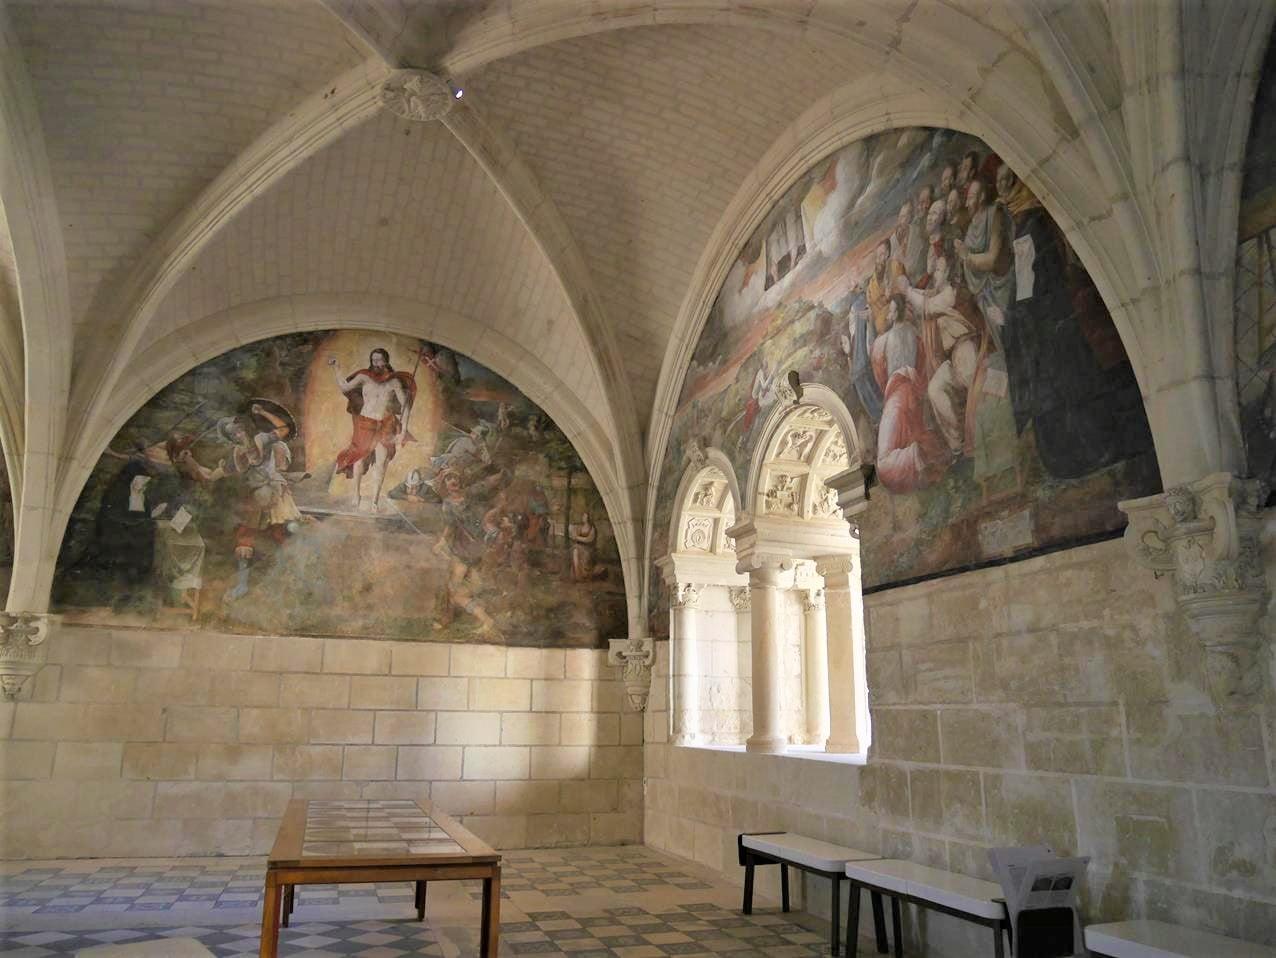 風弗洛修道院(Fontevraud)